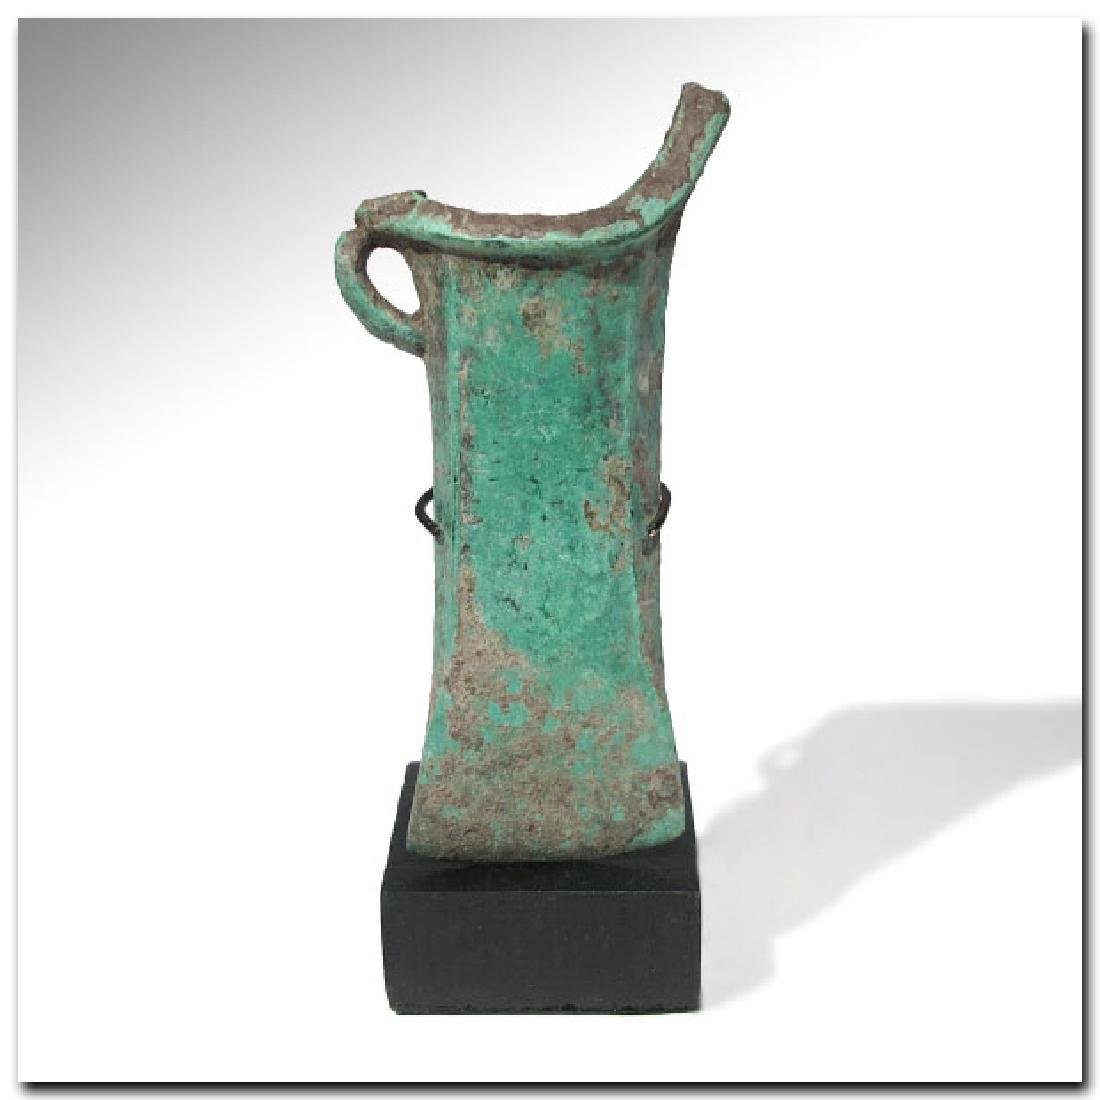 Bronze Age Axe Head, North European, c. 900-800 B.C.